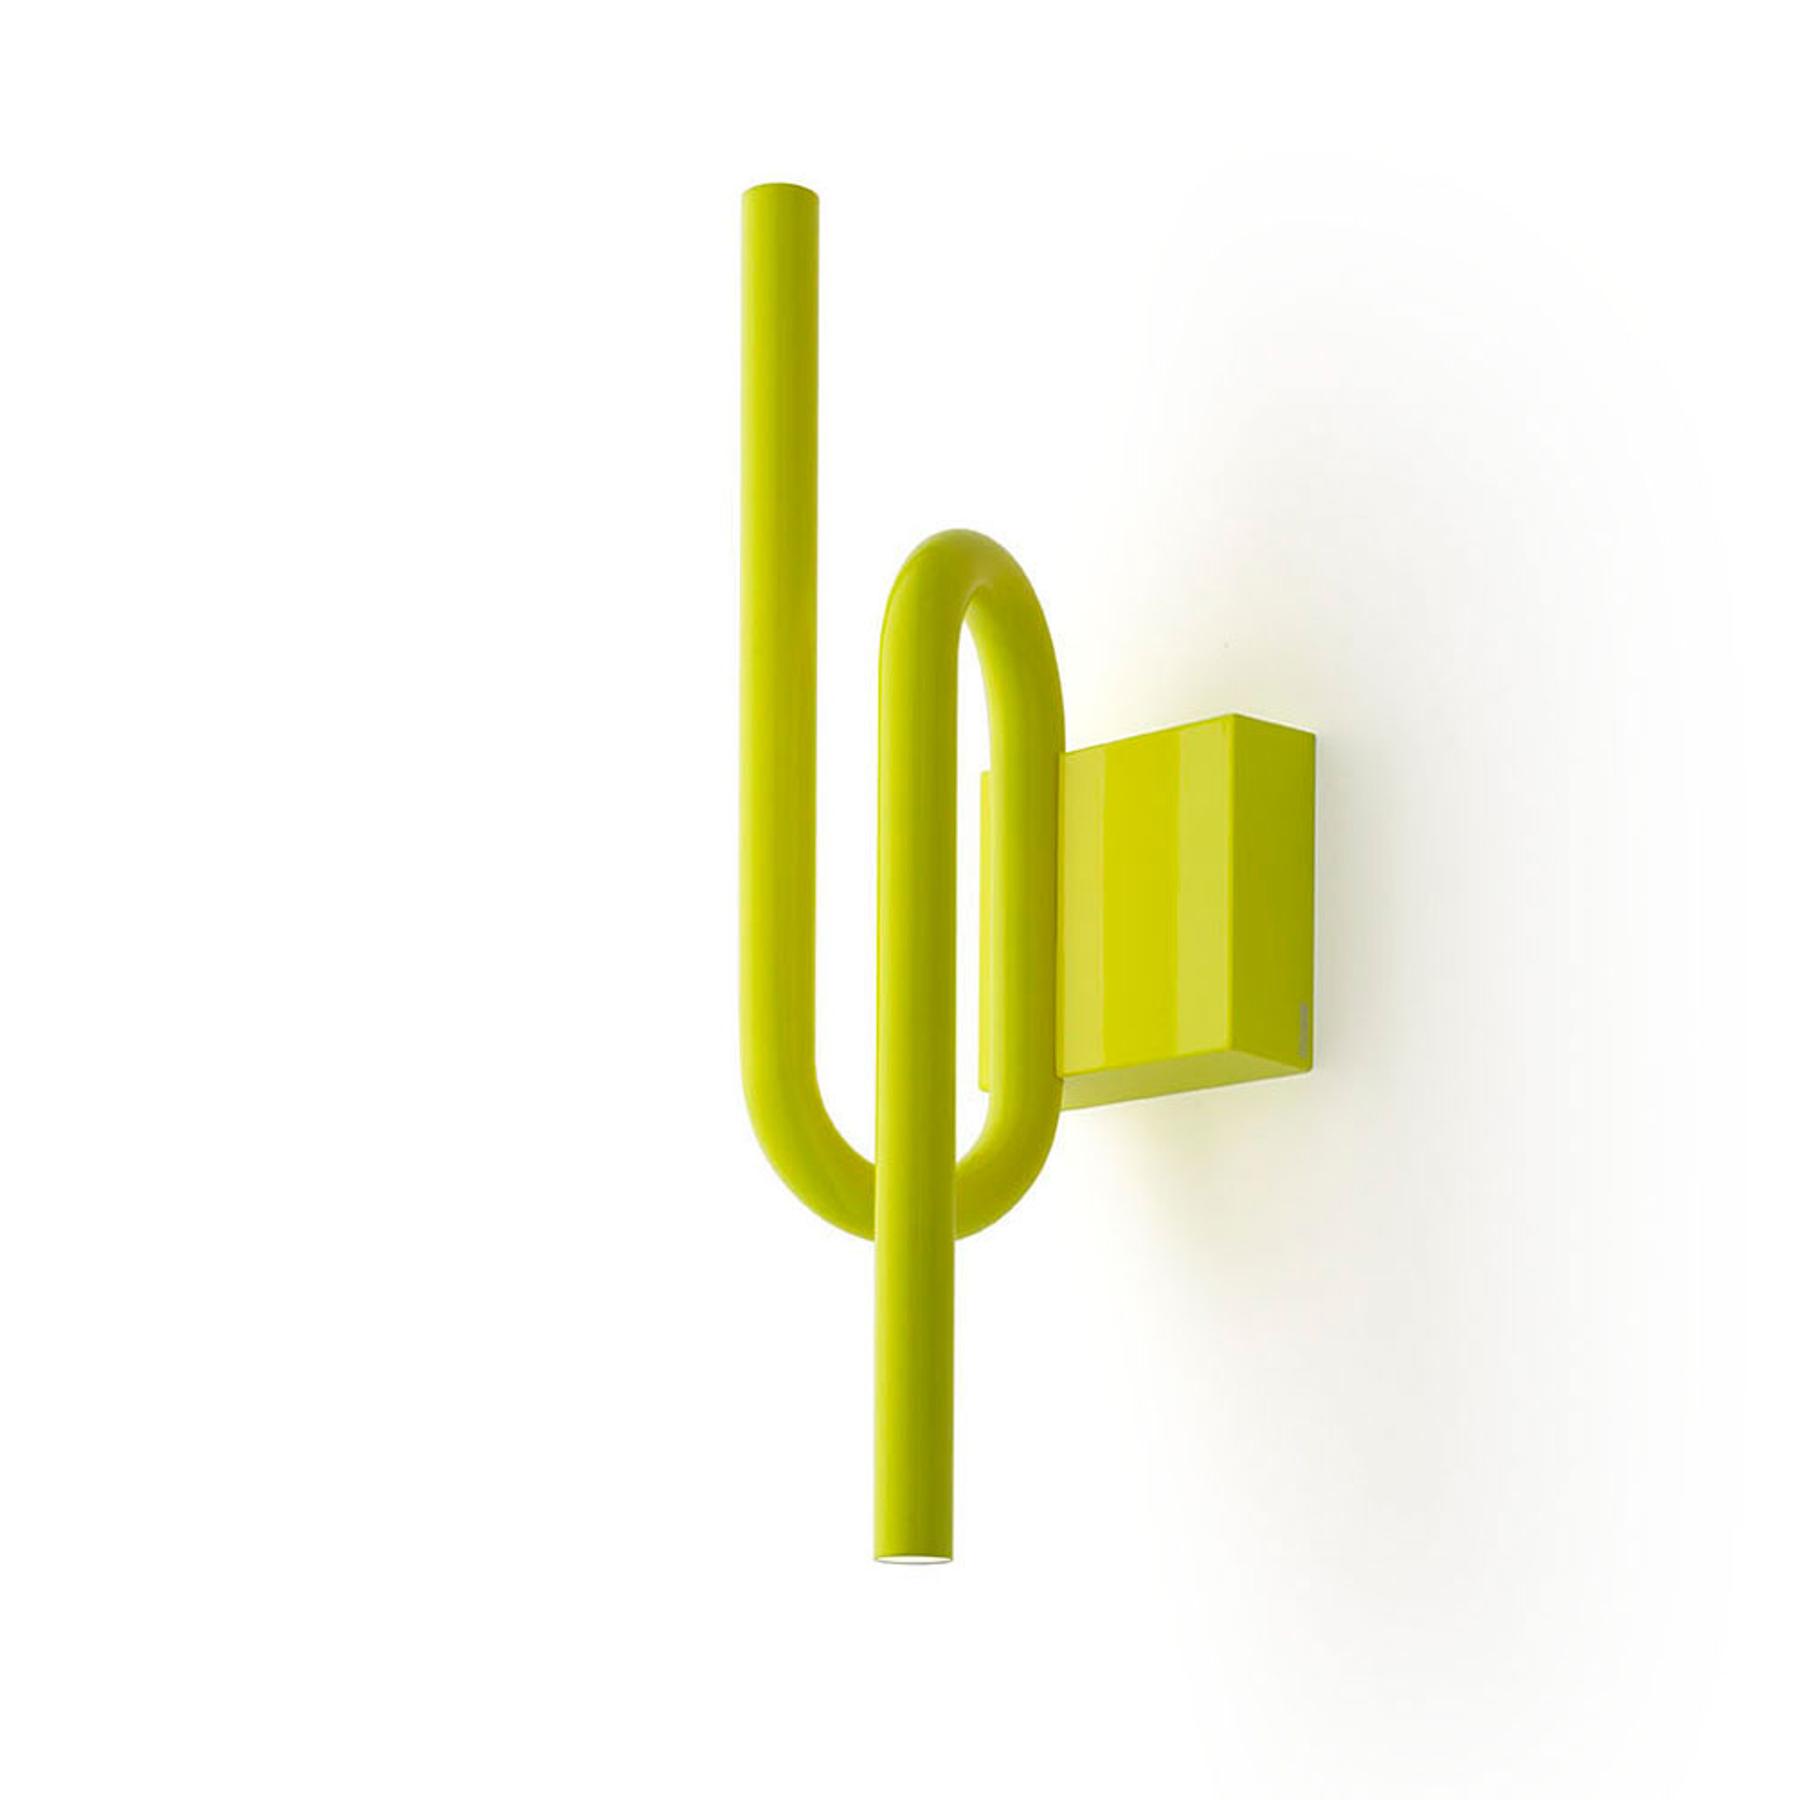 Foscarini Tobia LED-Wandleuchte gelb